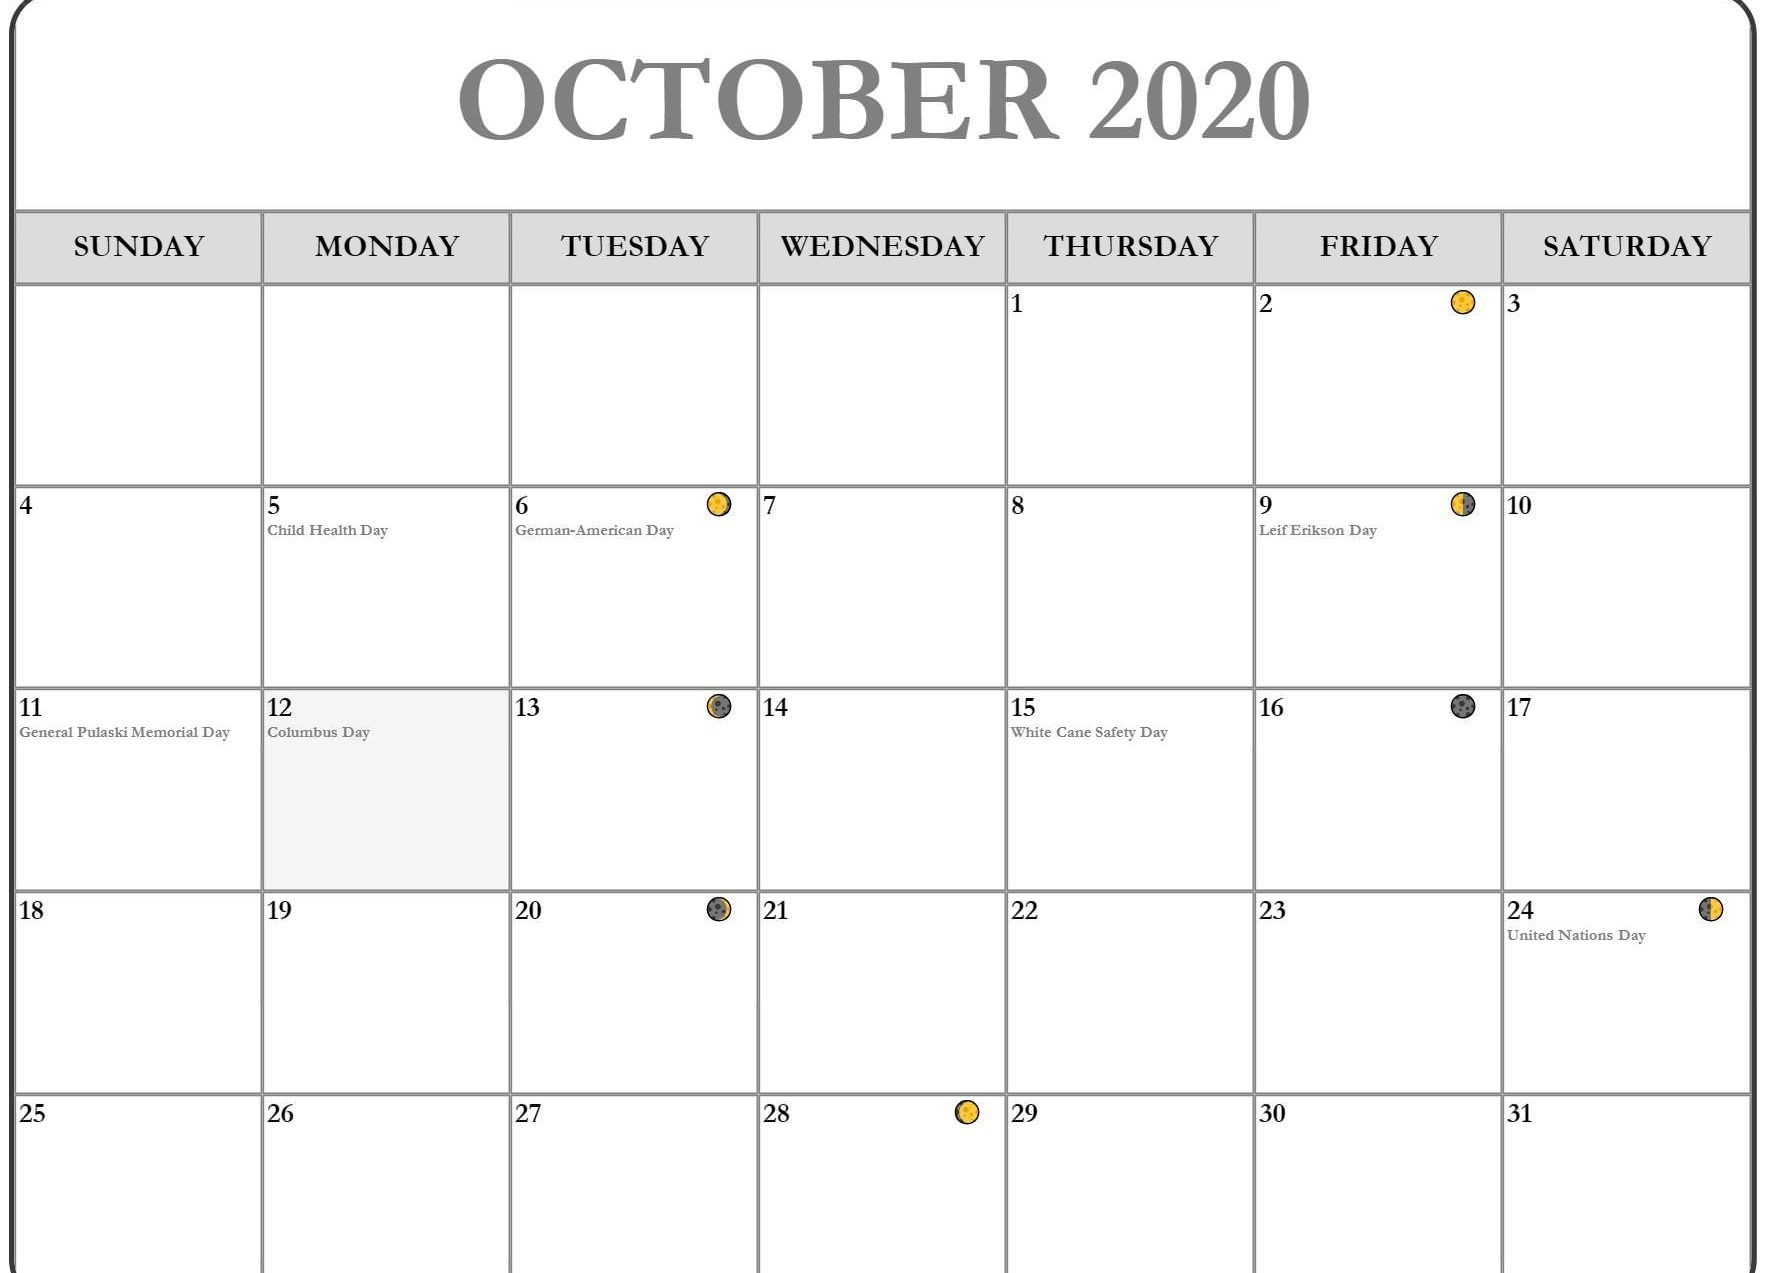 Blank October 2020 Calendar with Holidays